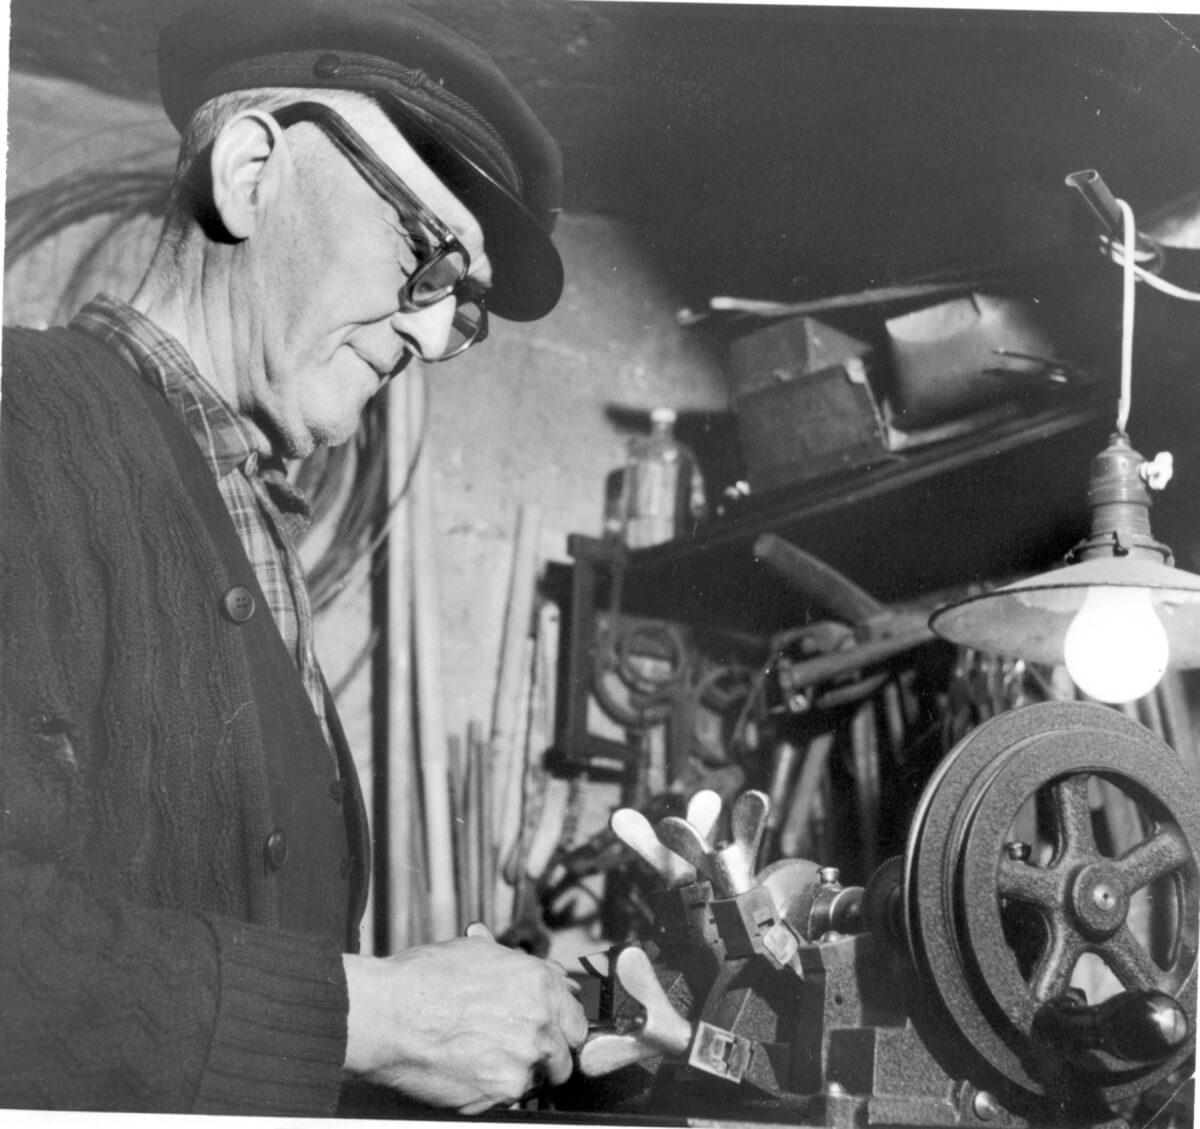 En man arbetar vid en maskin.